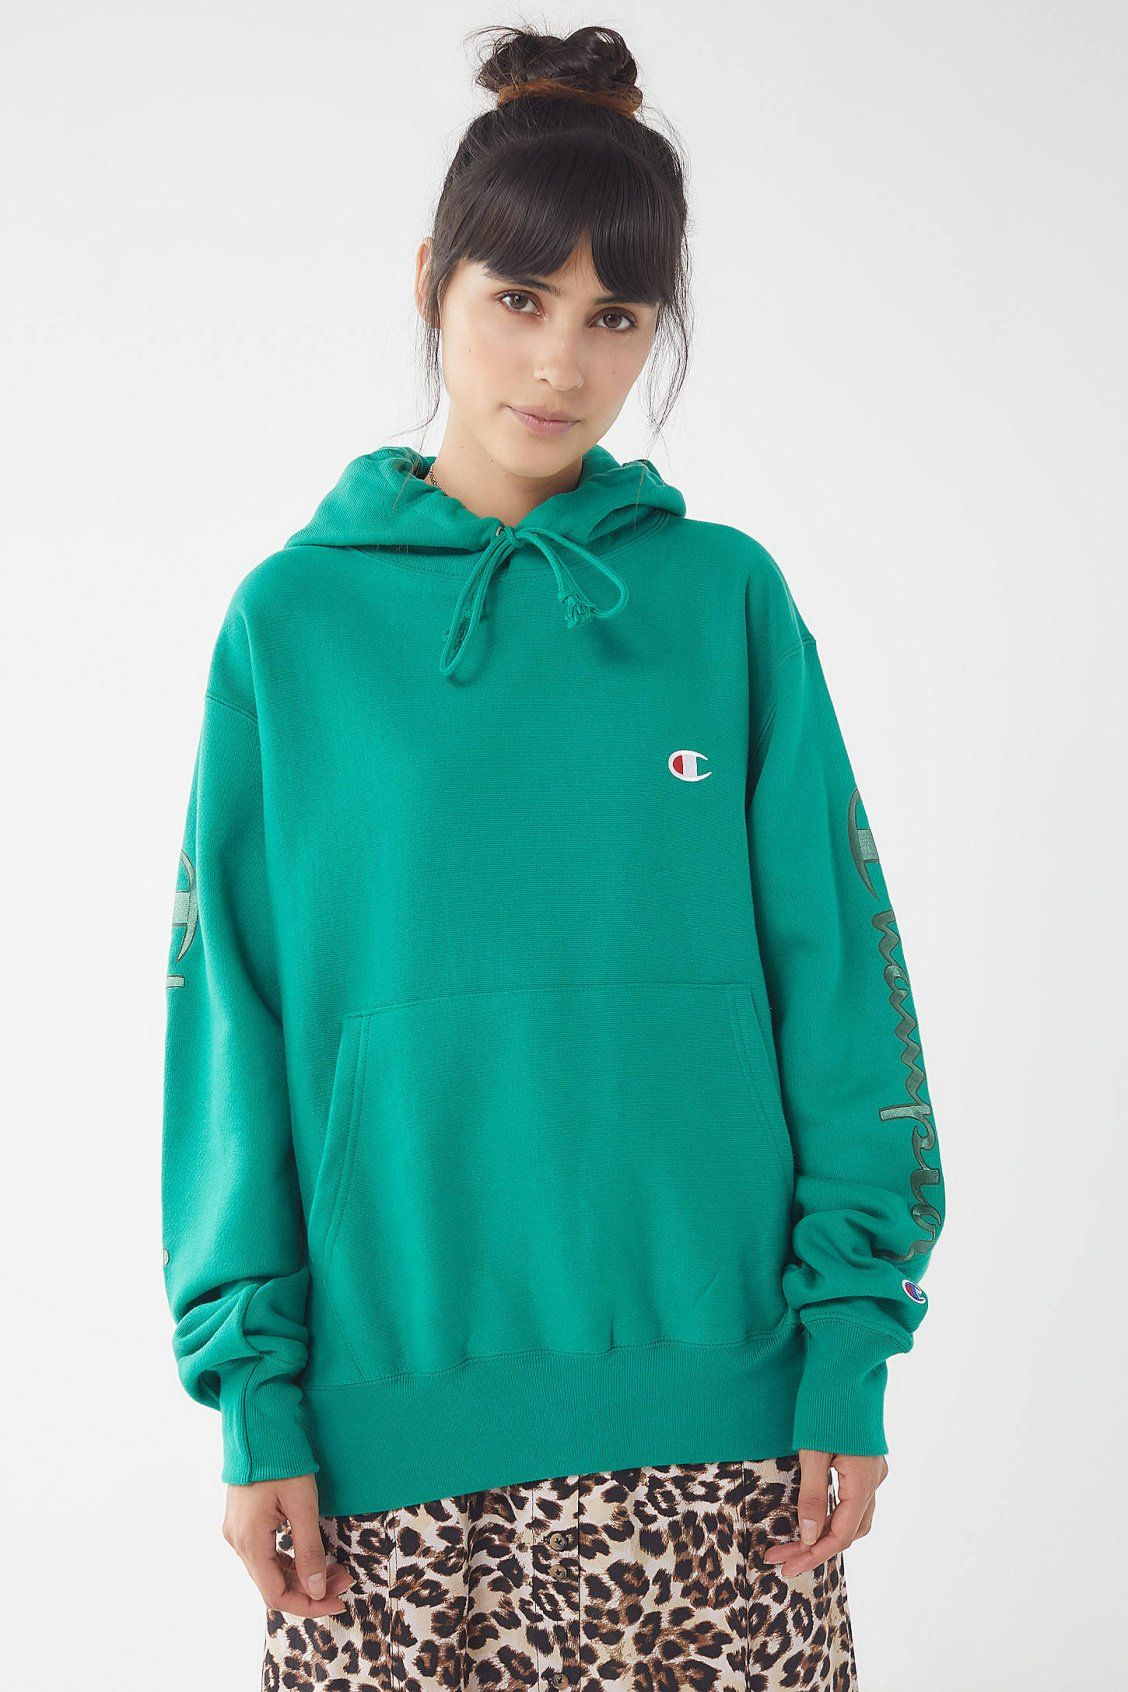 Champion Sweatshirt Turquoise